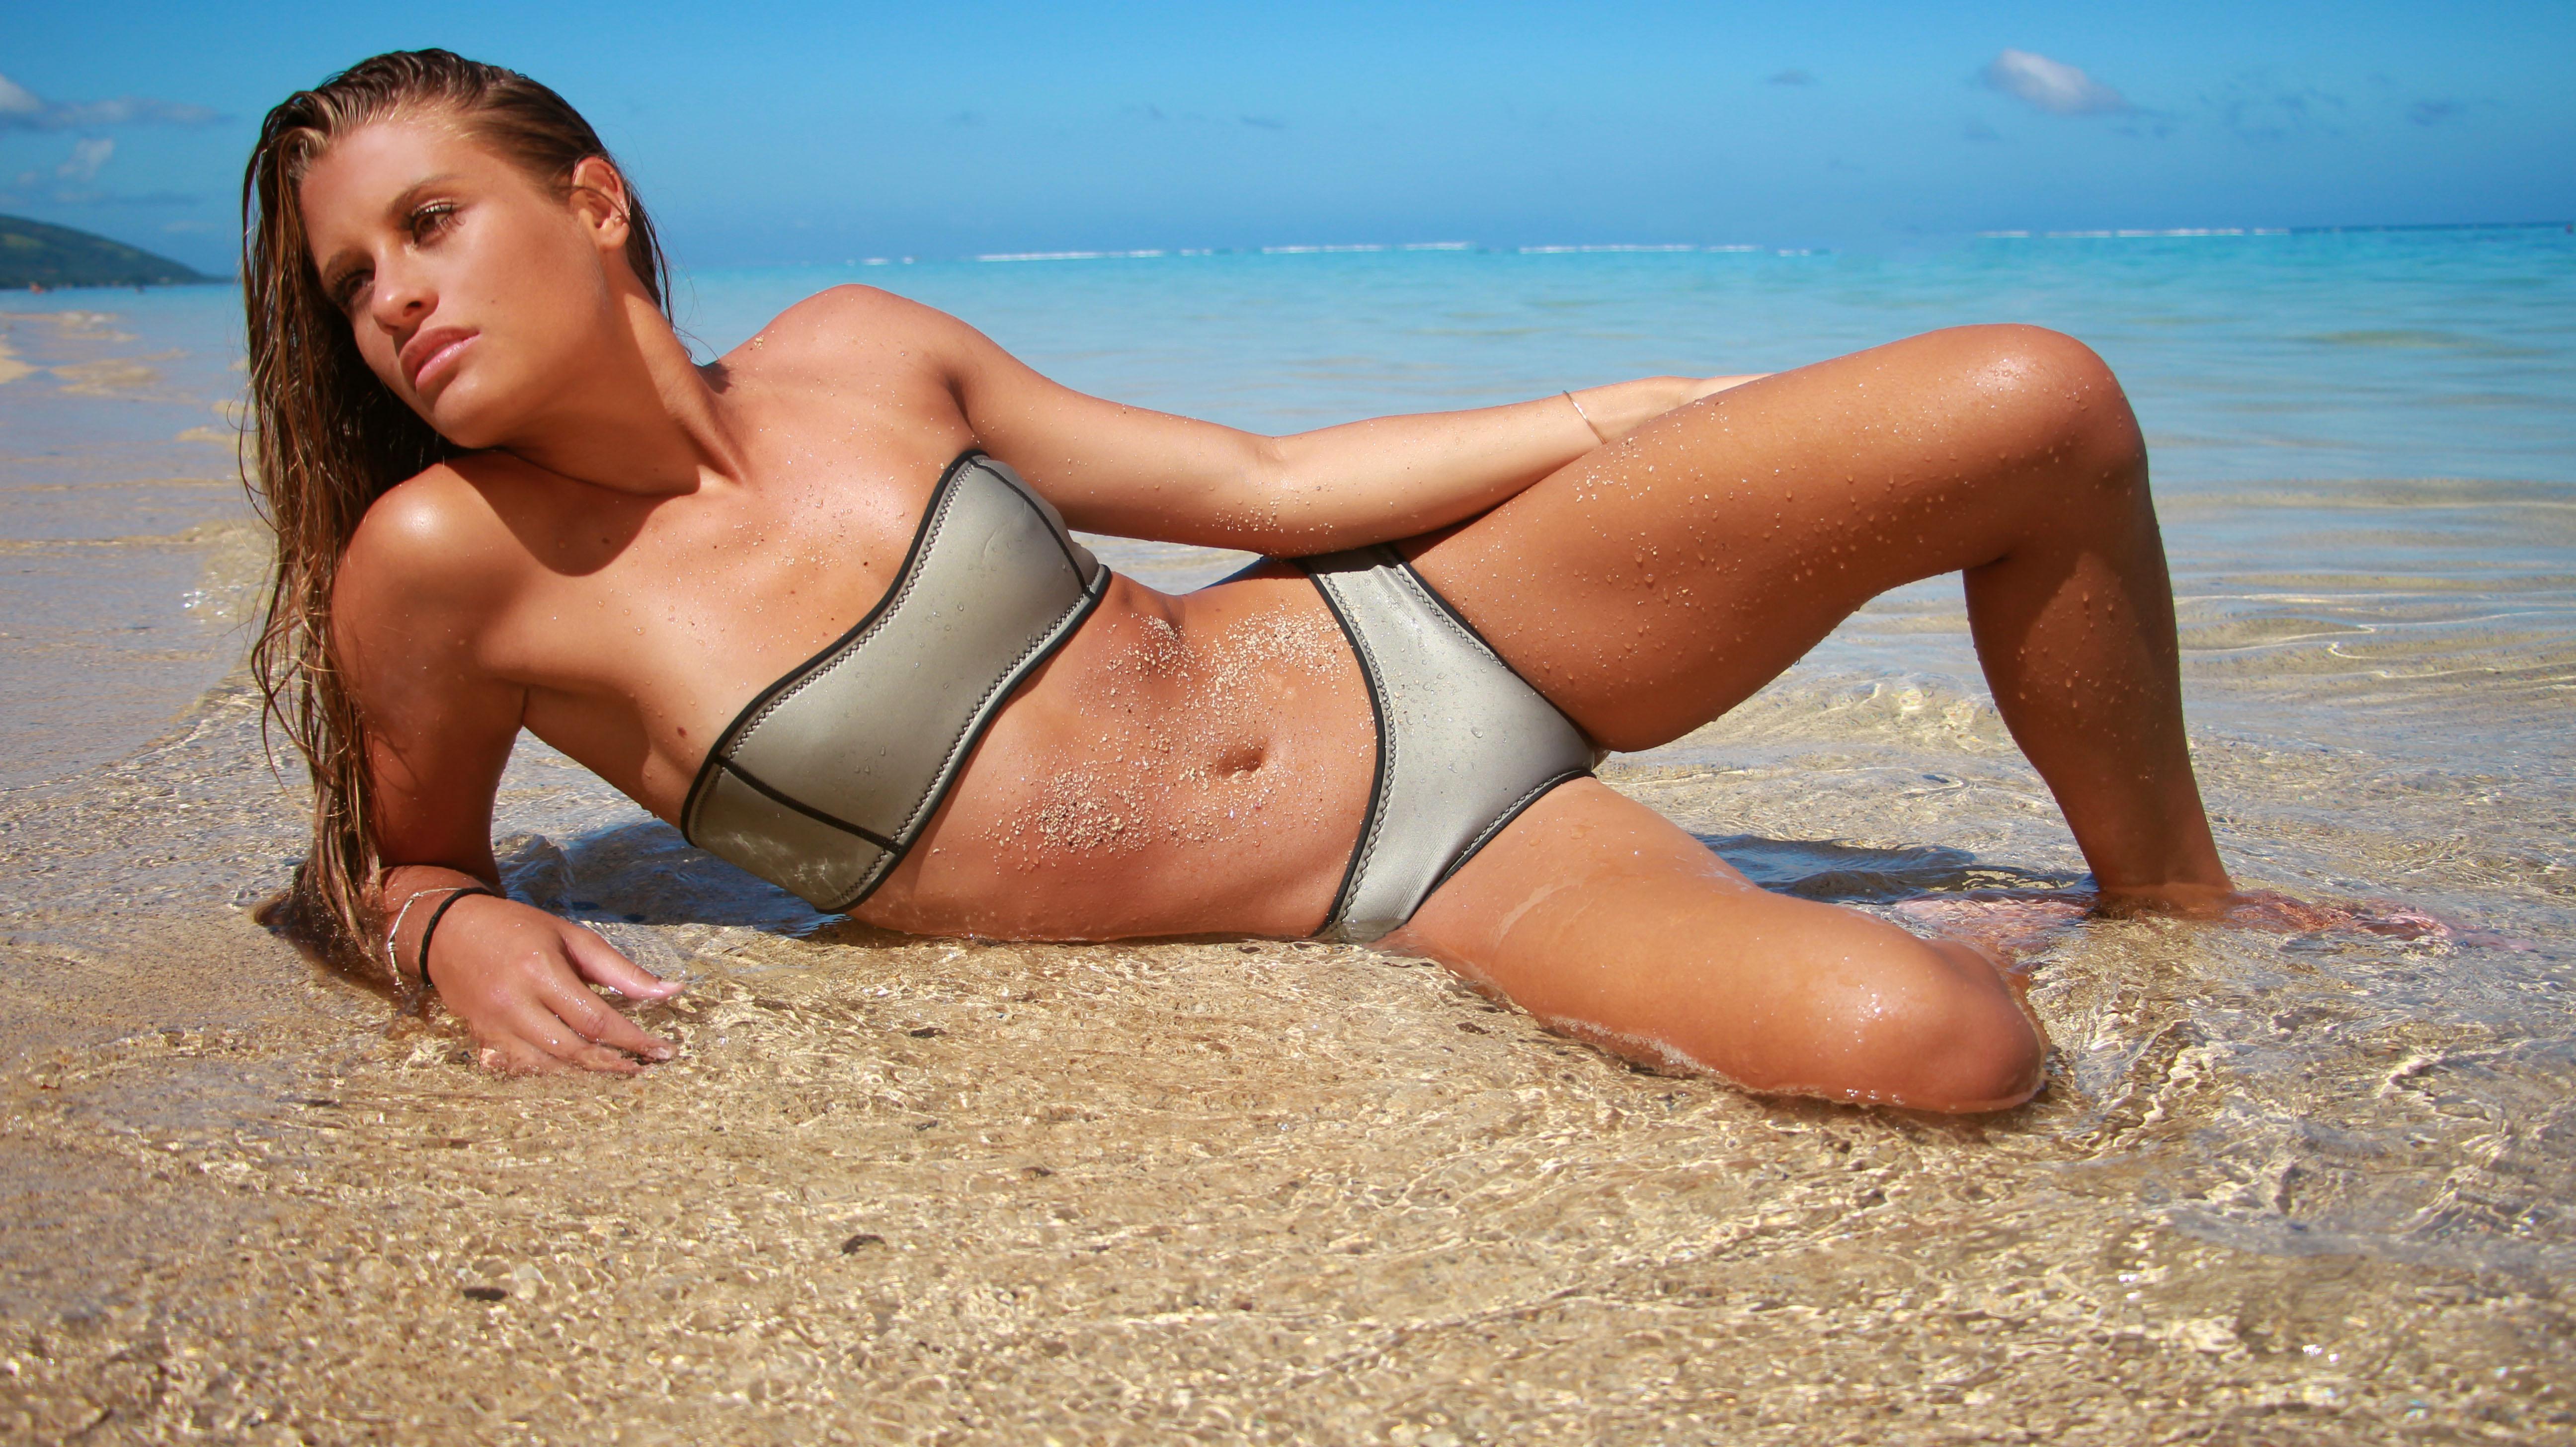 heimano buisson abysse le dernier etage magazine tahiti swimwear maillot de bain